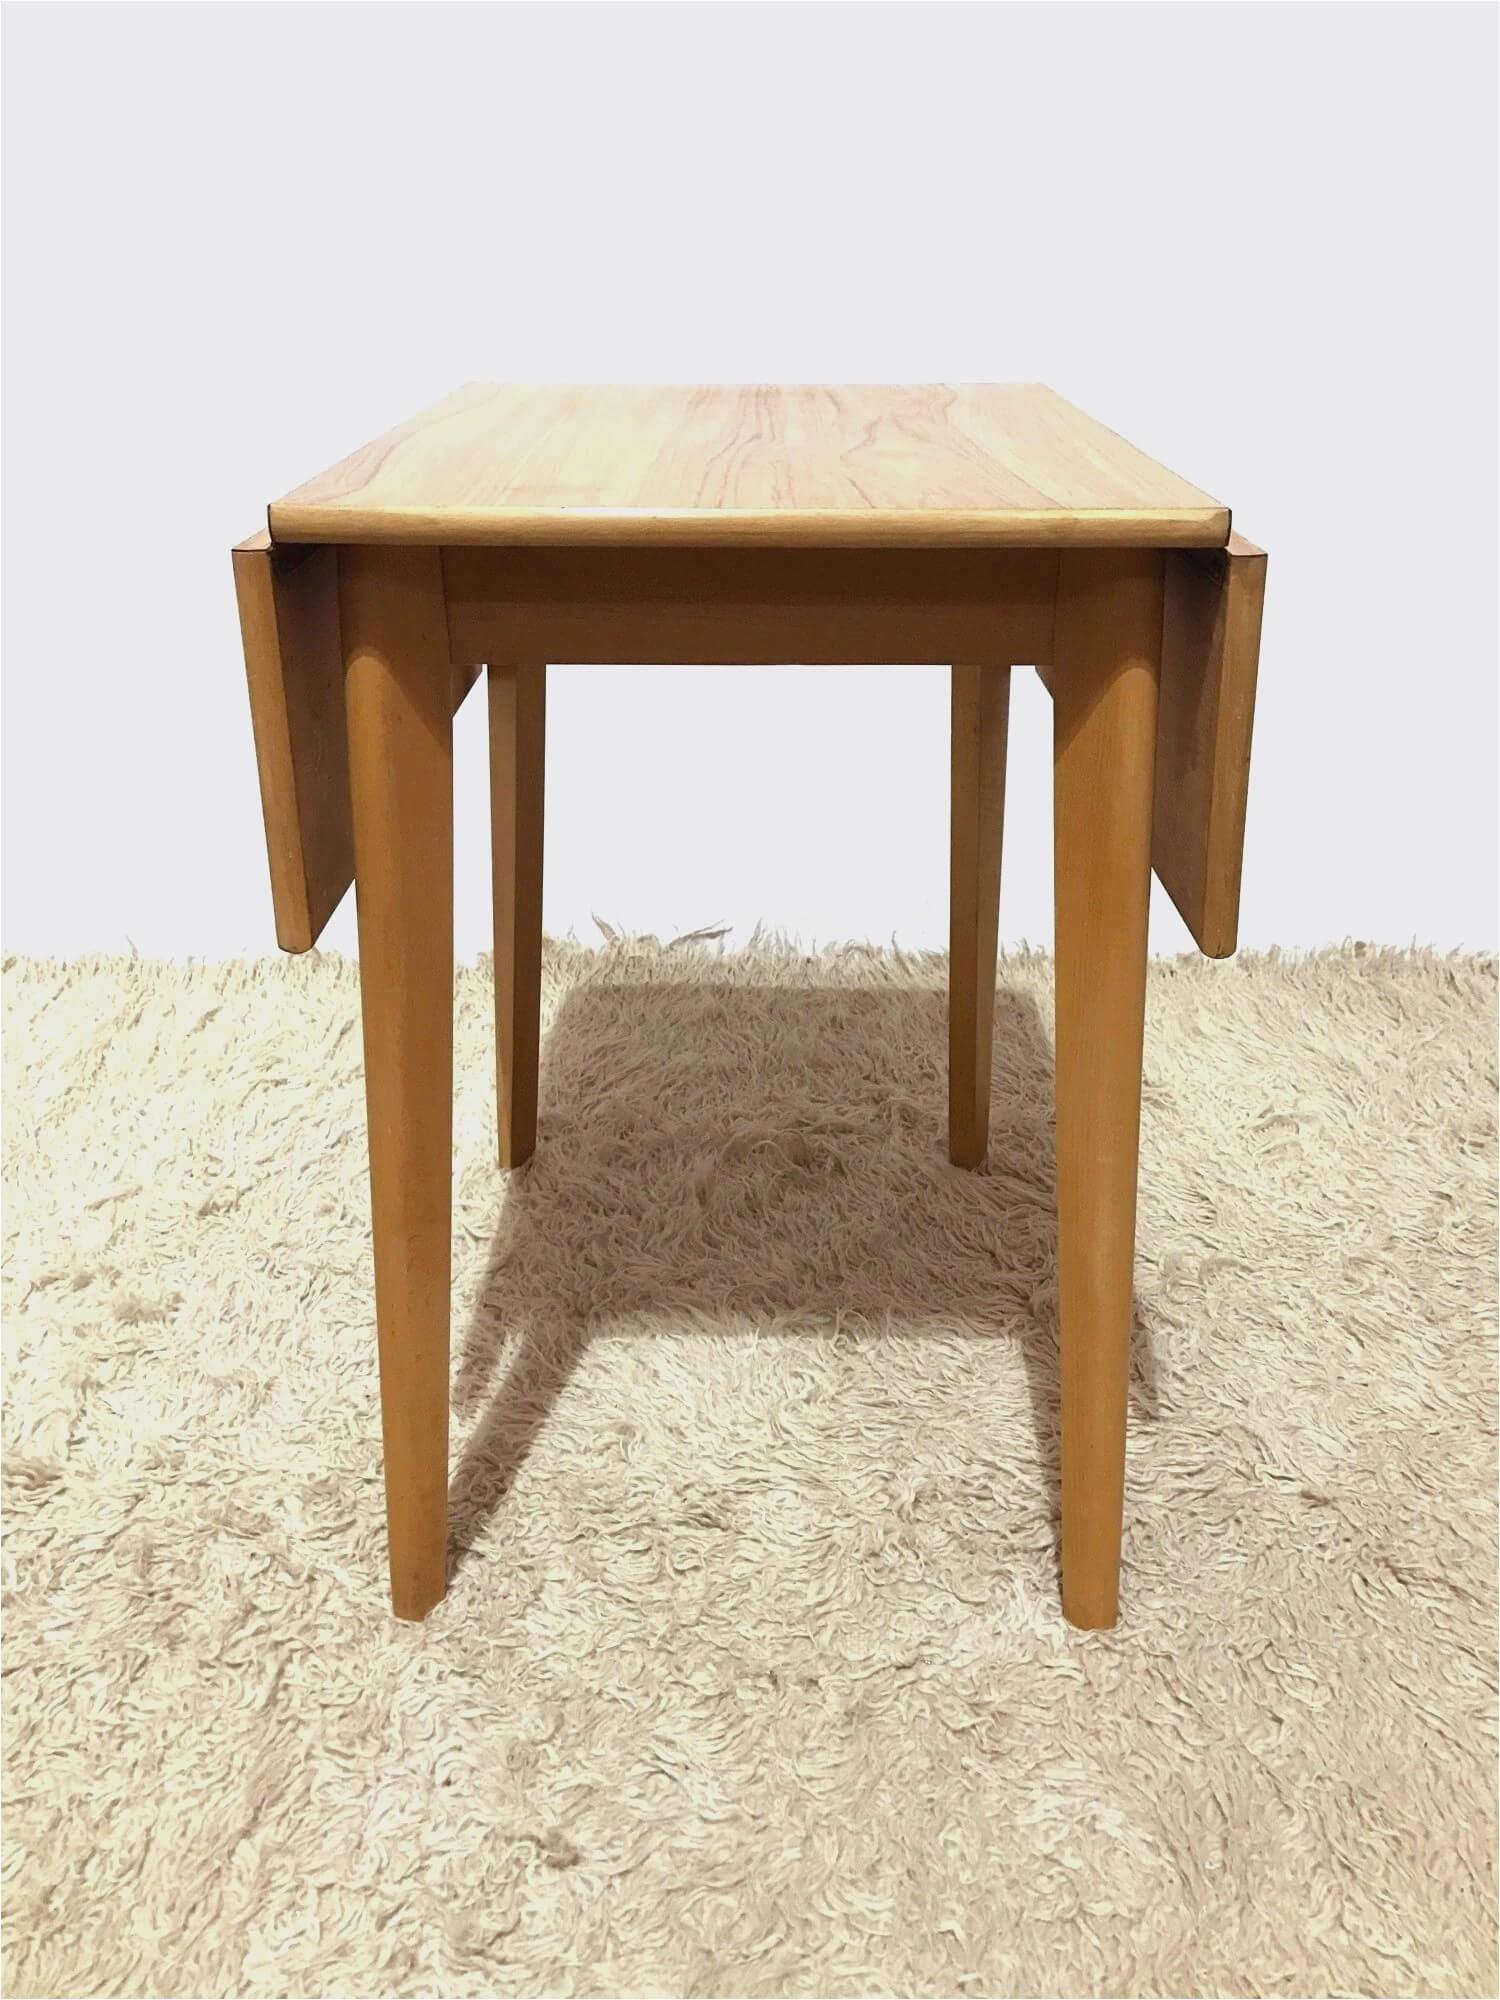 Ikea De Jardin Table Appiar Ronde Basse Io Tshrqd concernant Table Ronde Jardin Ikea